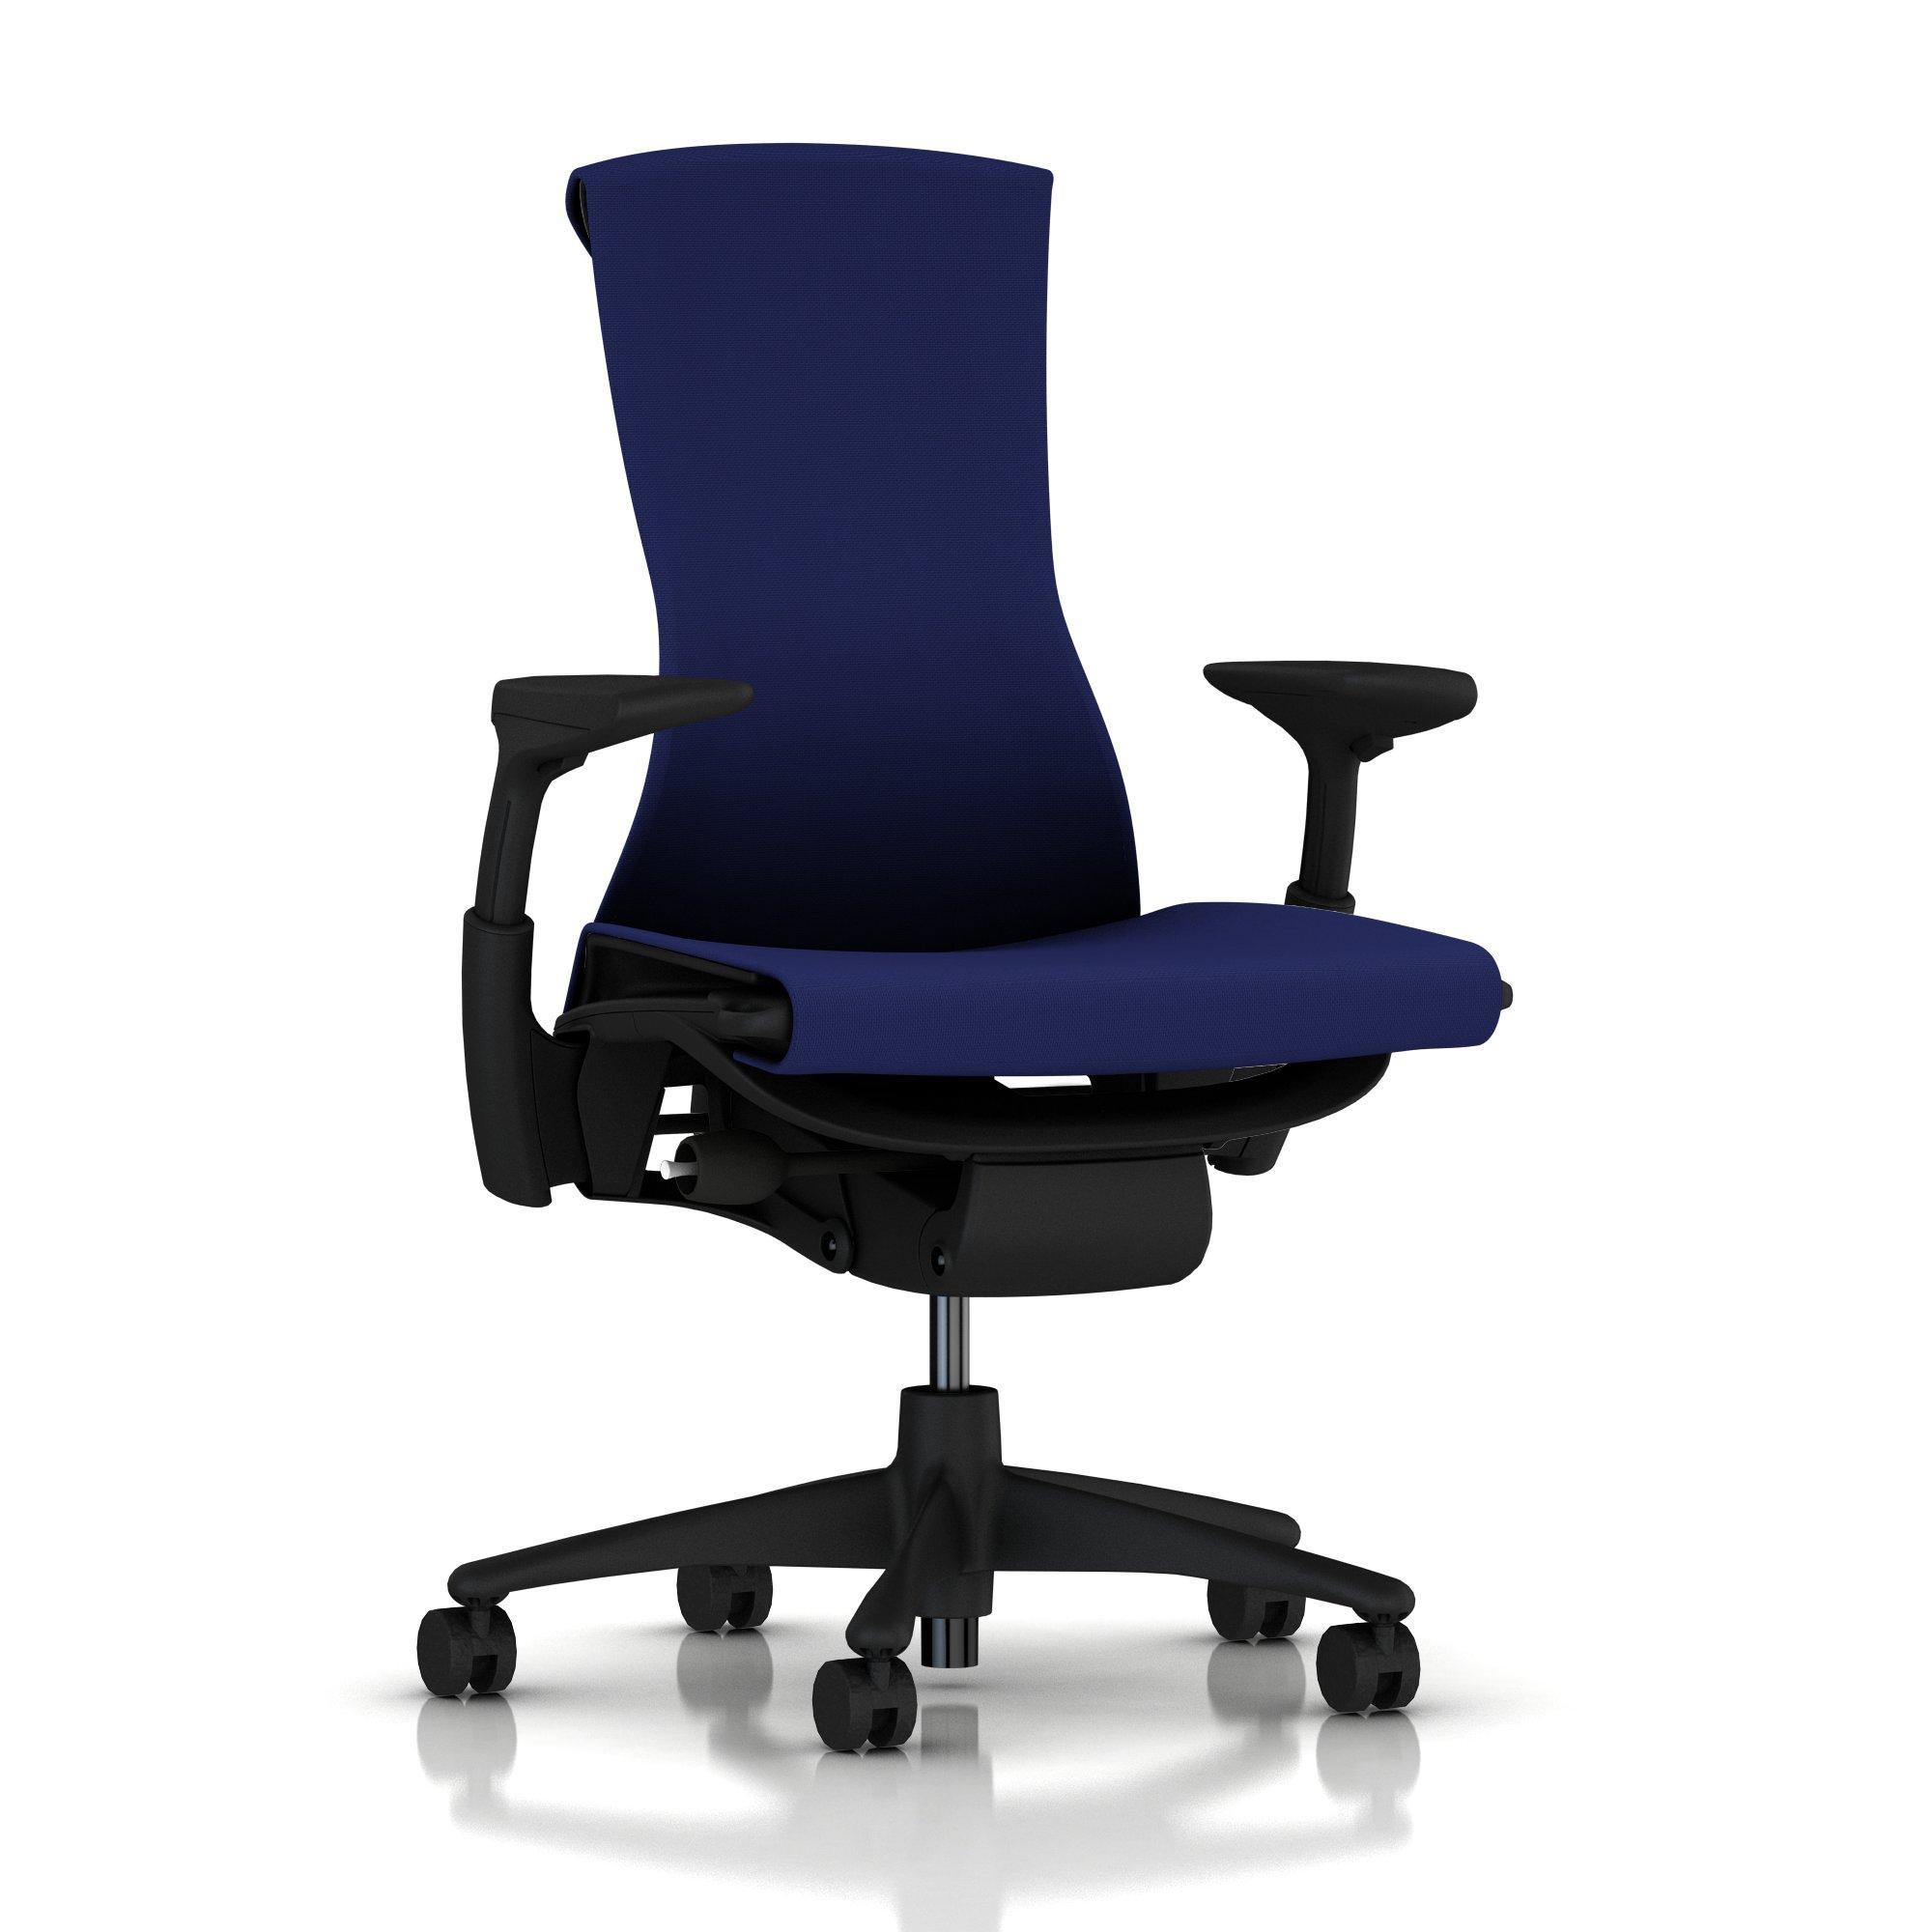 Herman Miller Embody Chair Twilight Blue Rhythm with